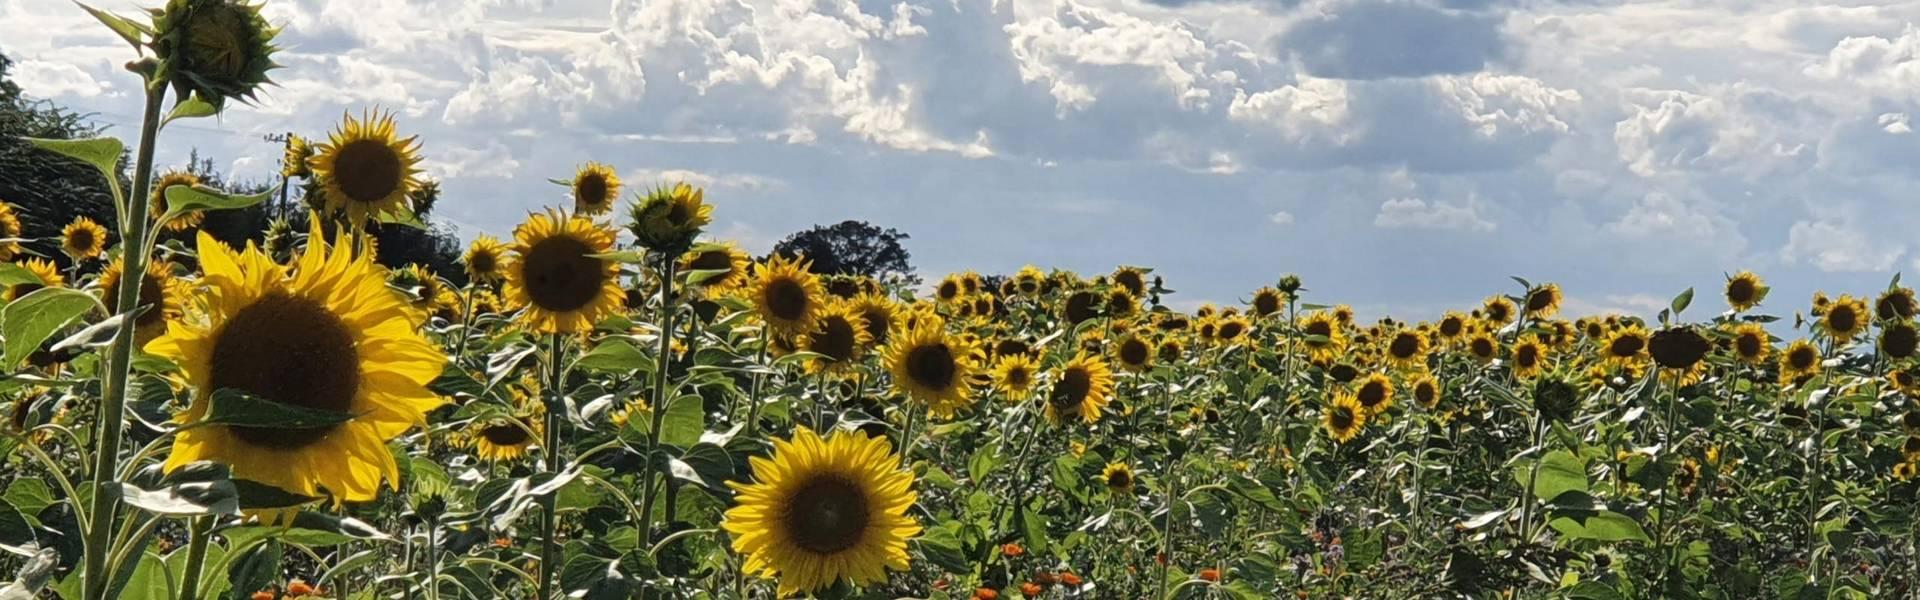 Sonnenblumenfeld ©Landratsamt Saale-Orla-Kreis, Pressestelle